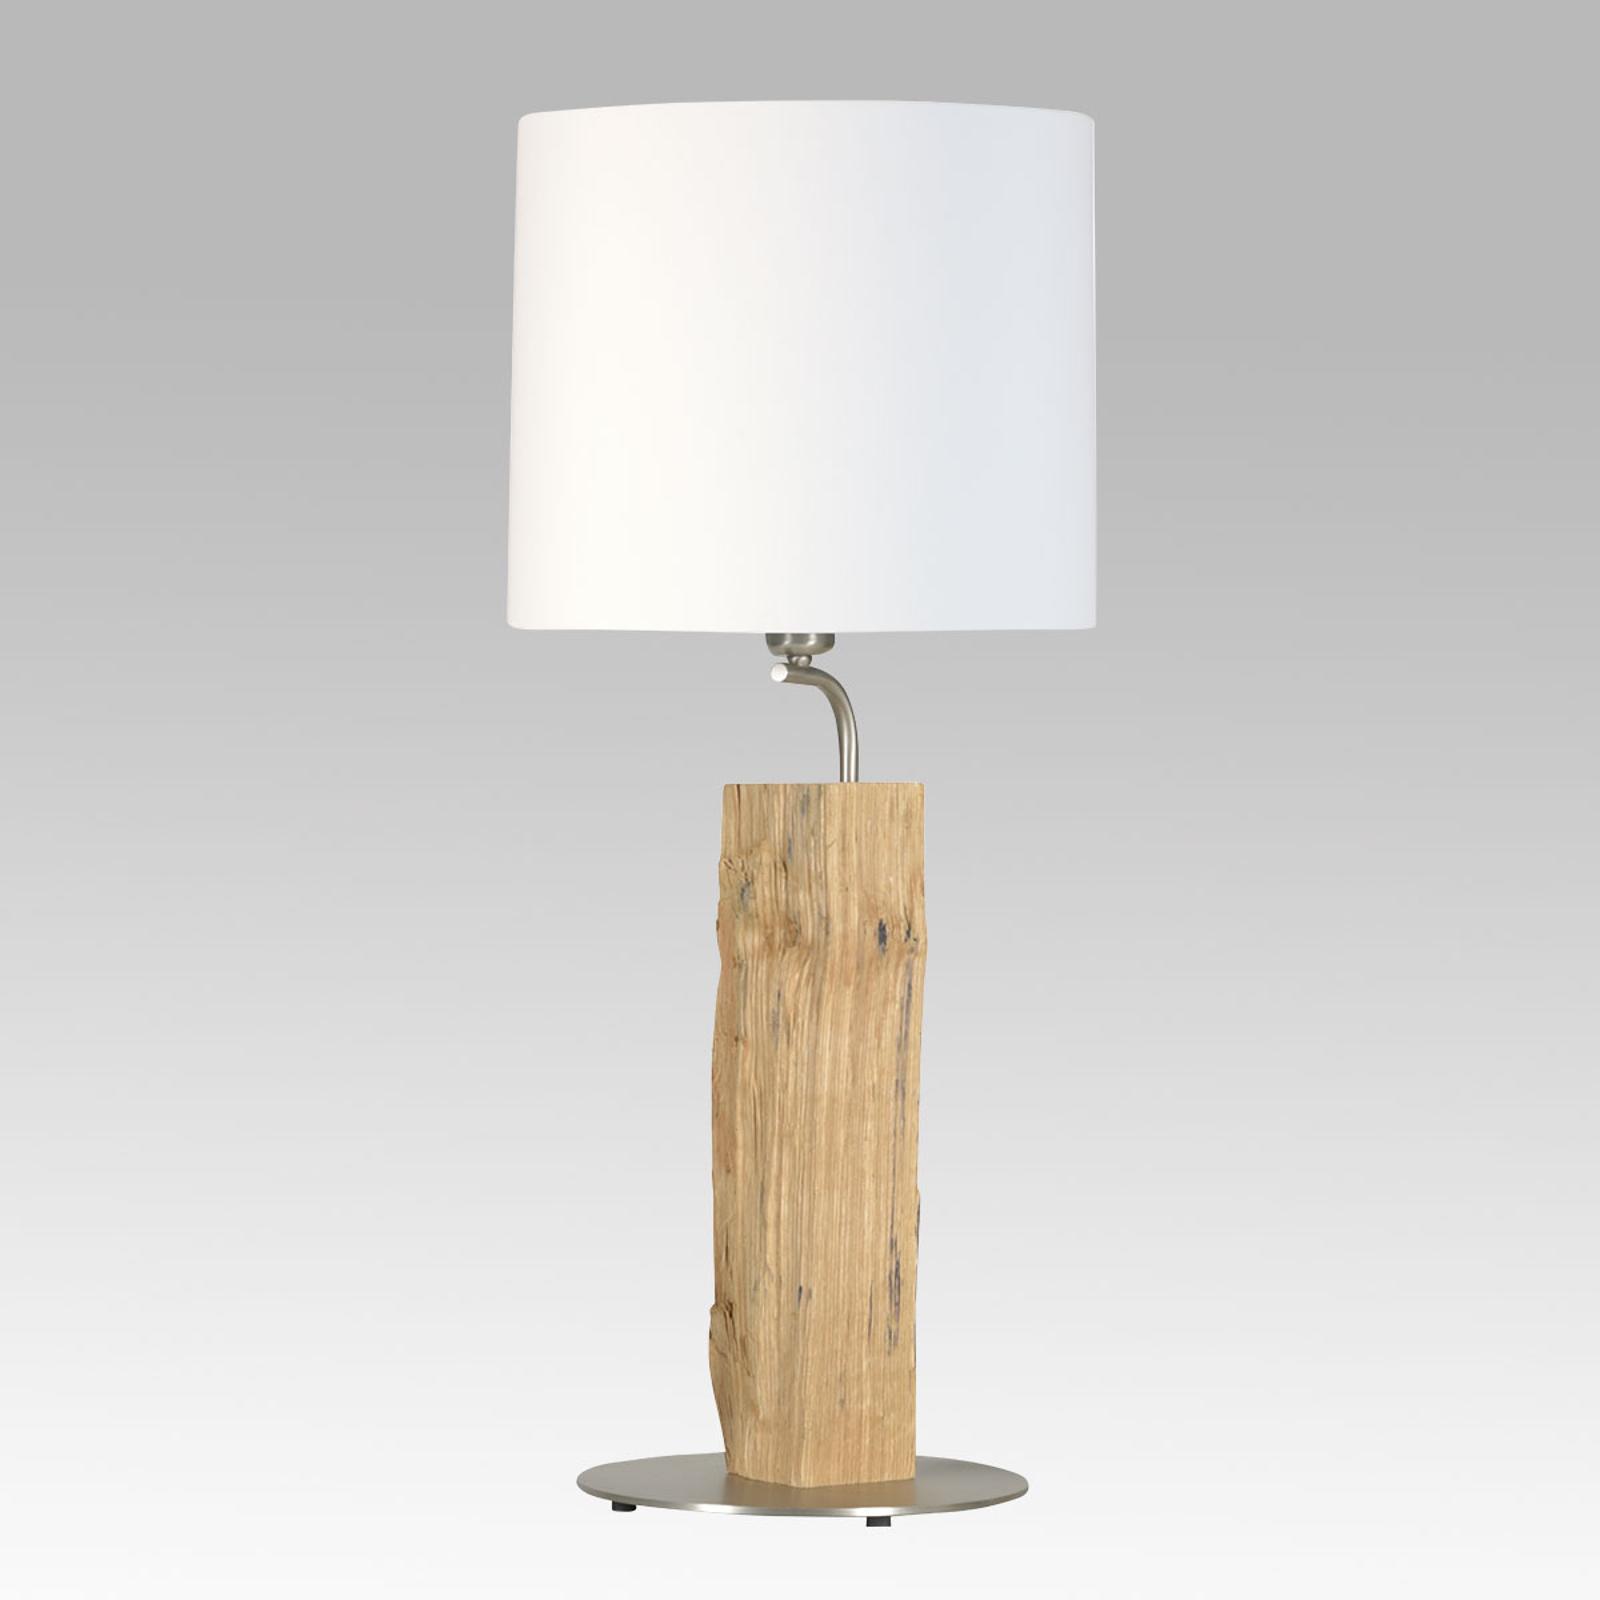 Neuer Kavalier tafellamp met houtelement, 56 cm